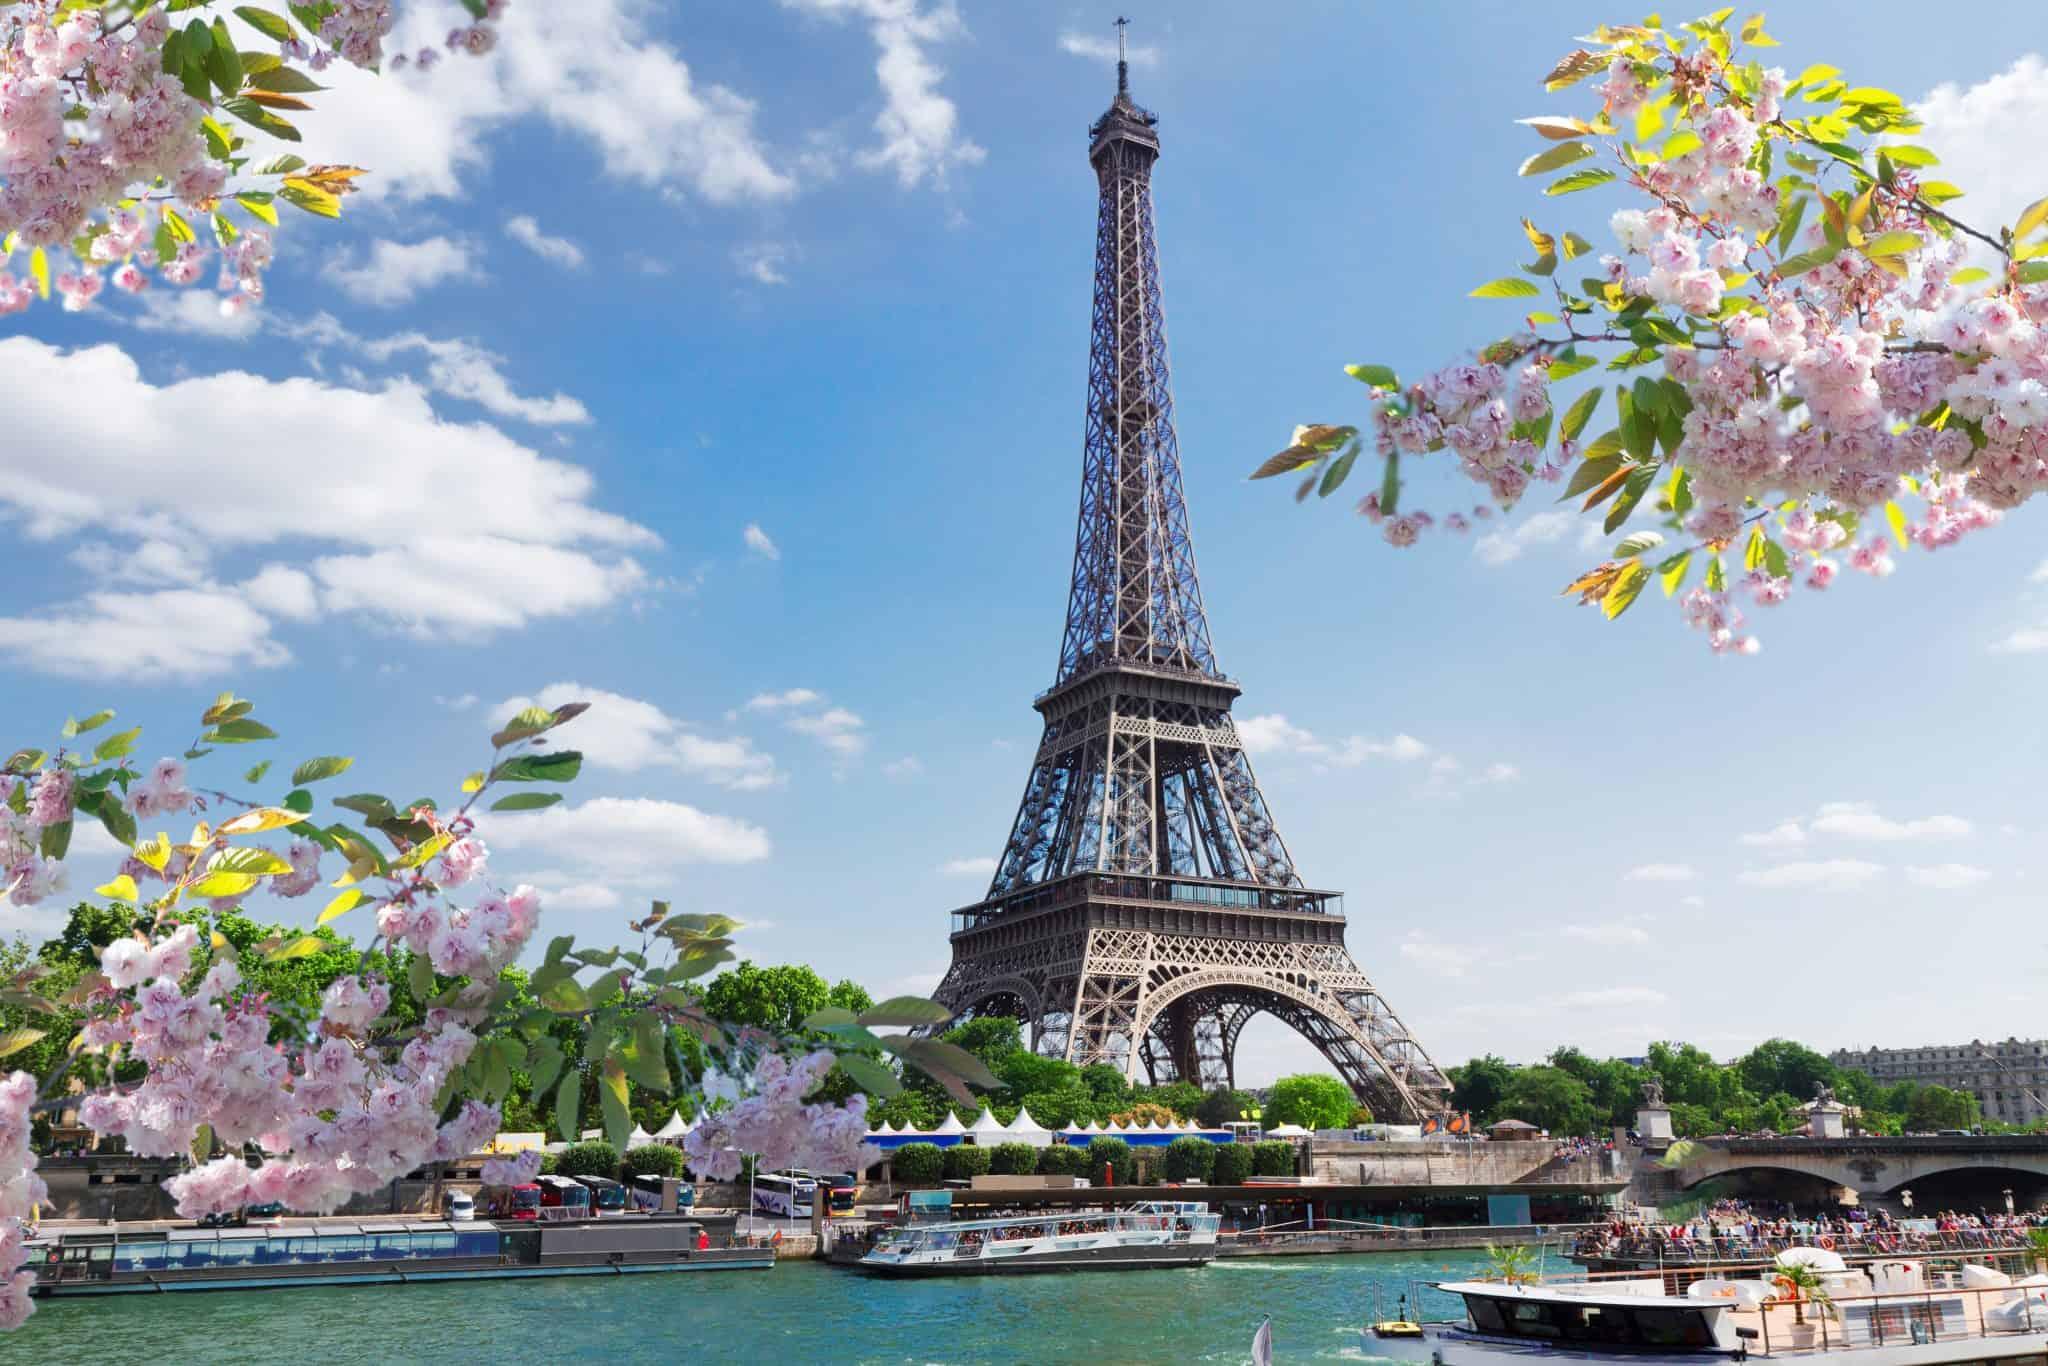 Eiffel Tower in Spring time - 4 days in Paris trip planner